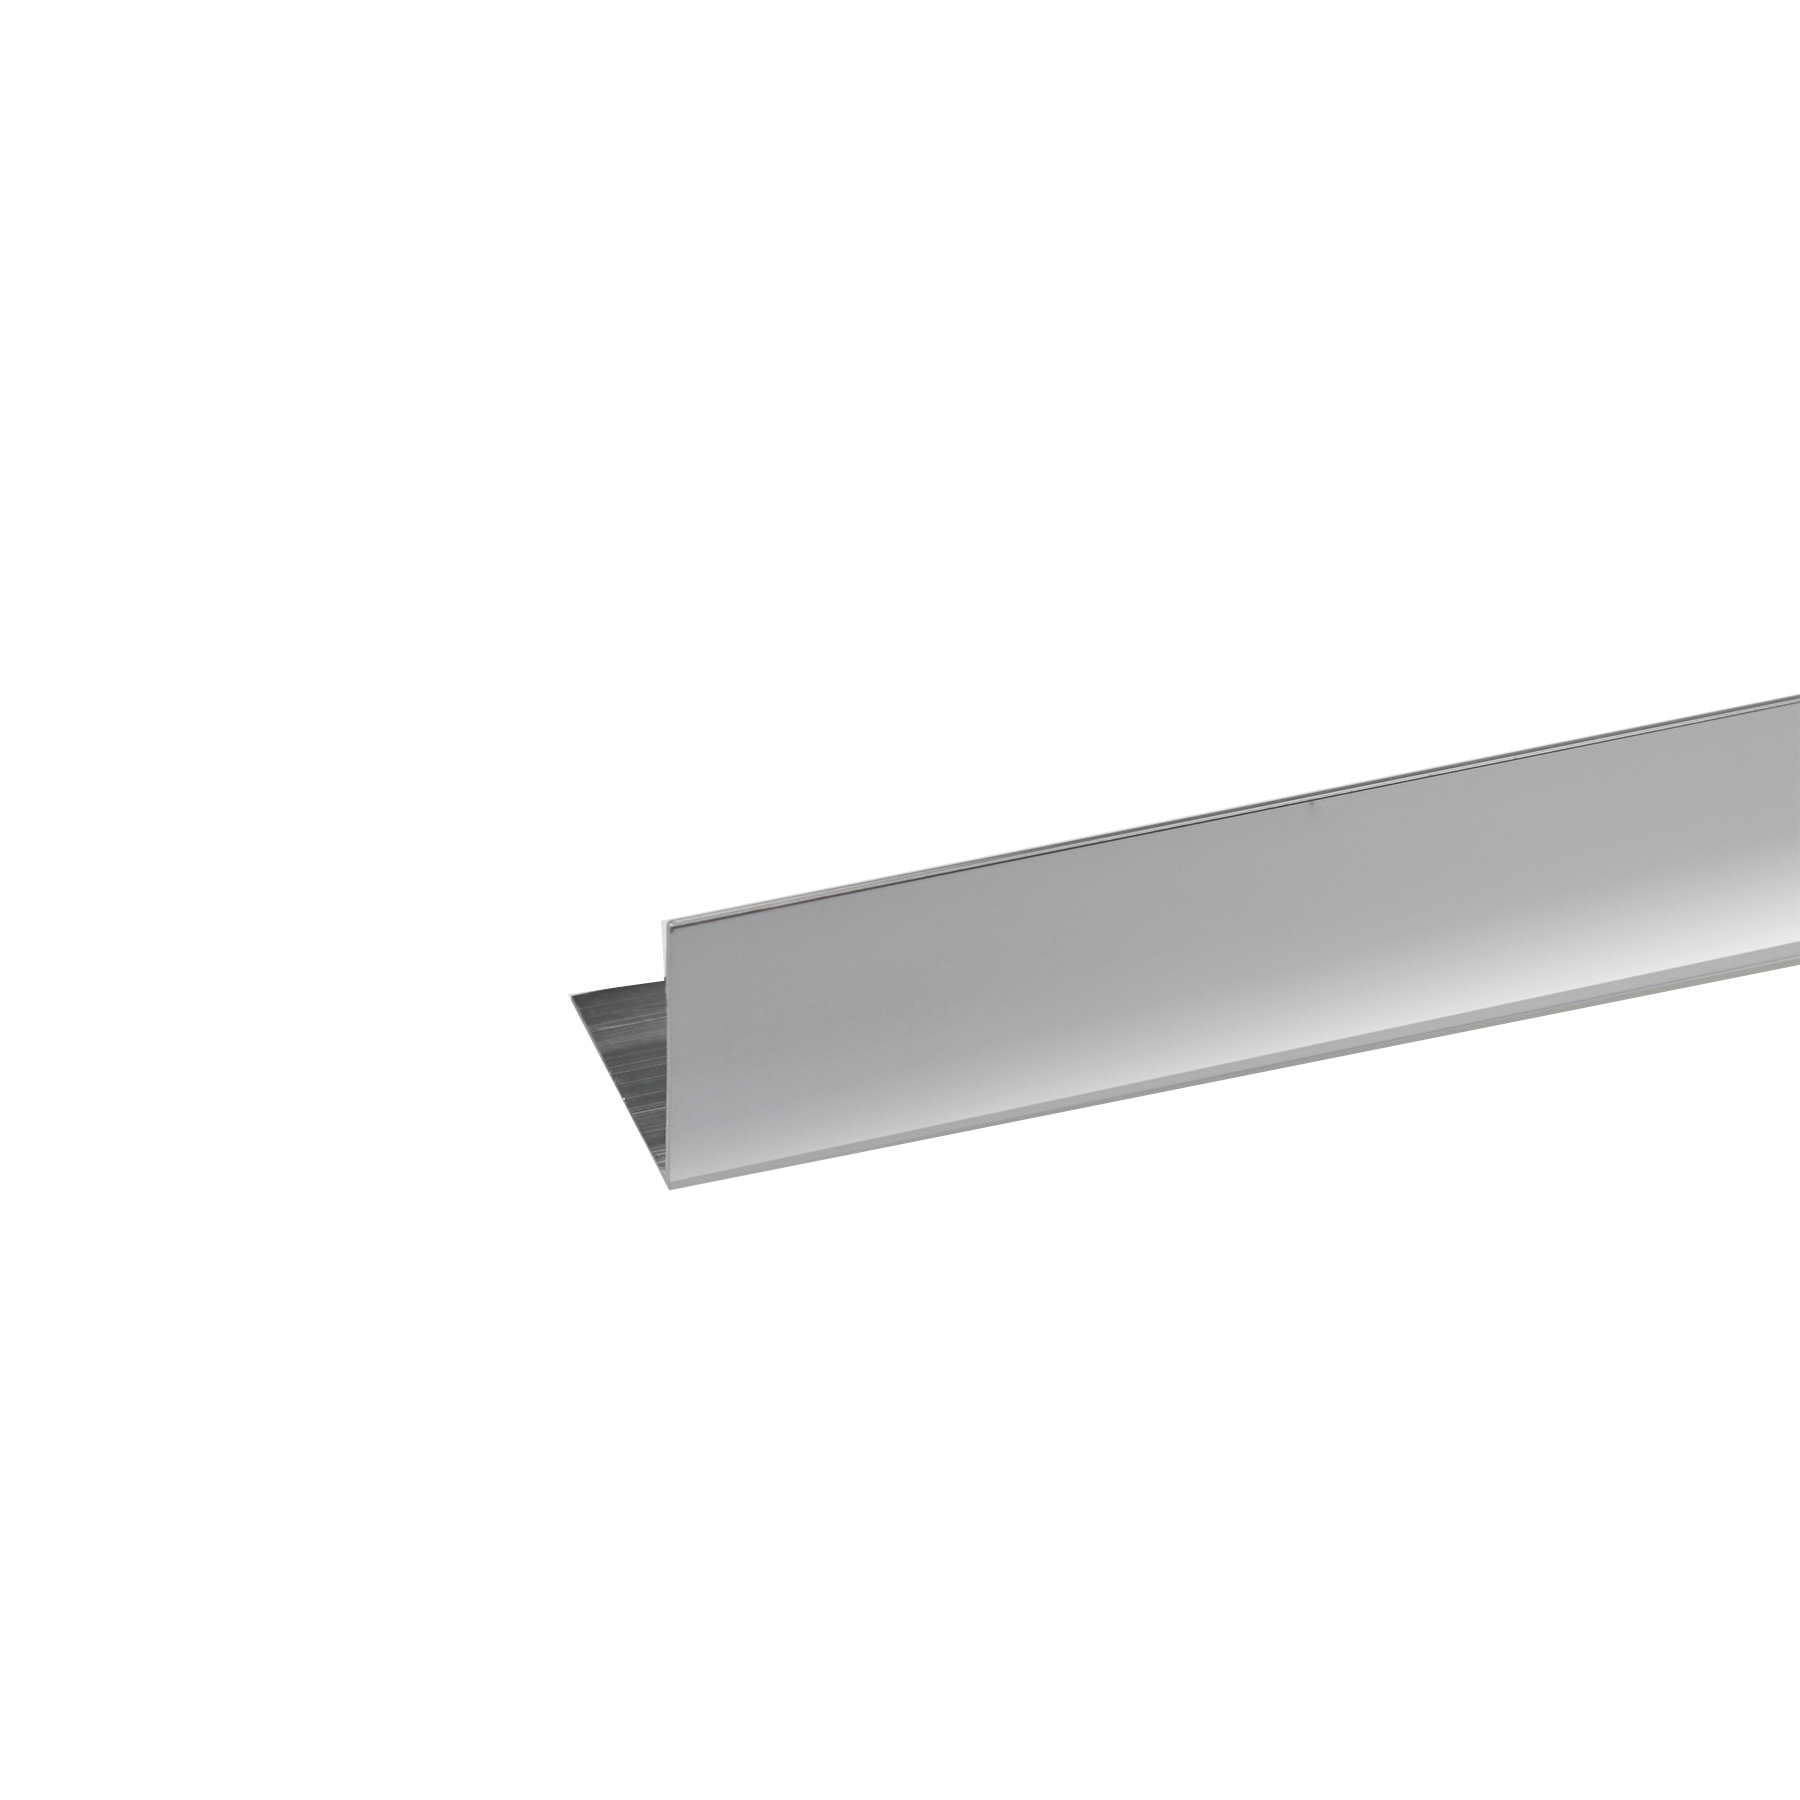 Perfil alum nio angular 1mx10x10mm brilhante leroy merlin - Perfil aluminio leroy merlin ...